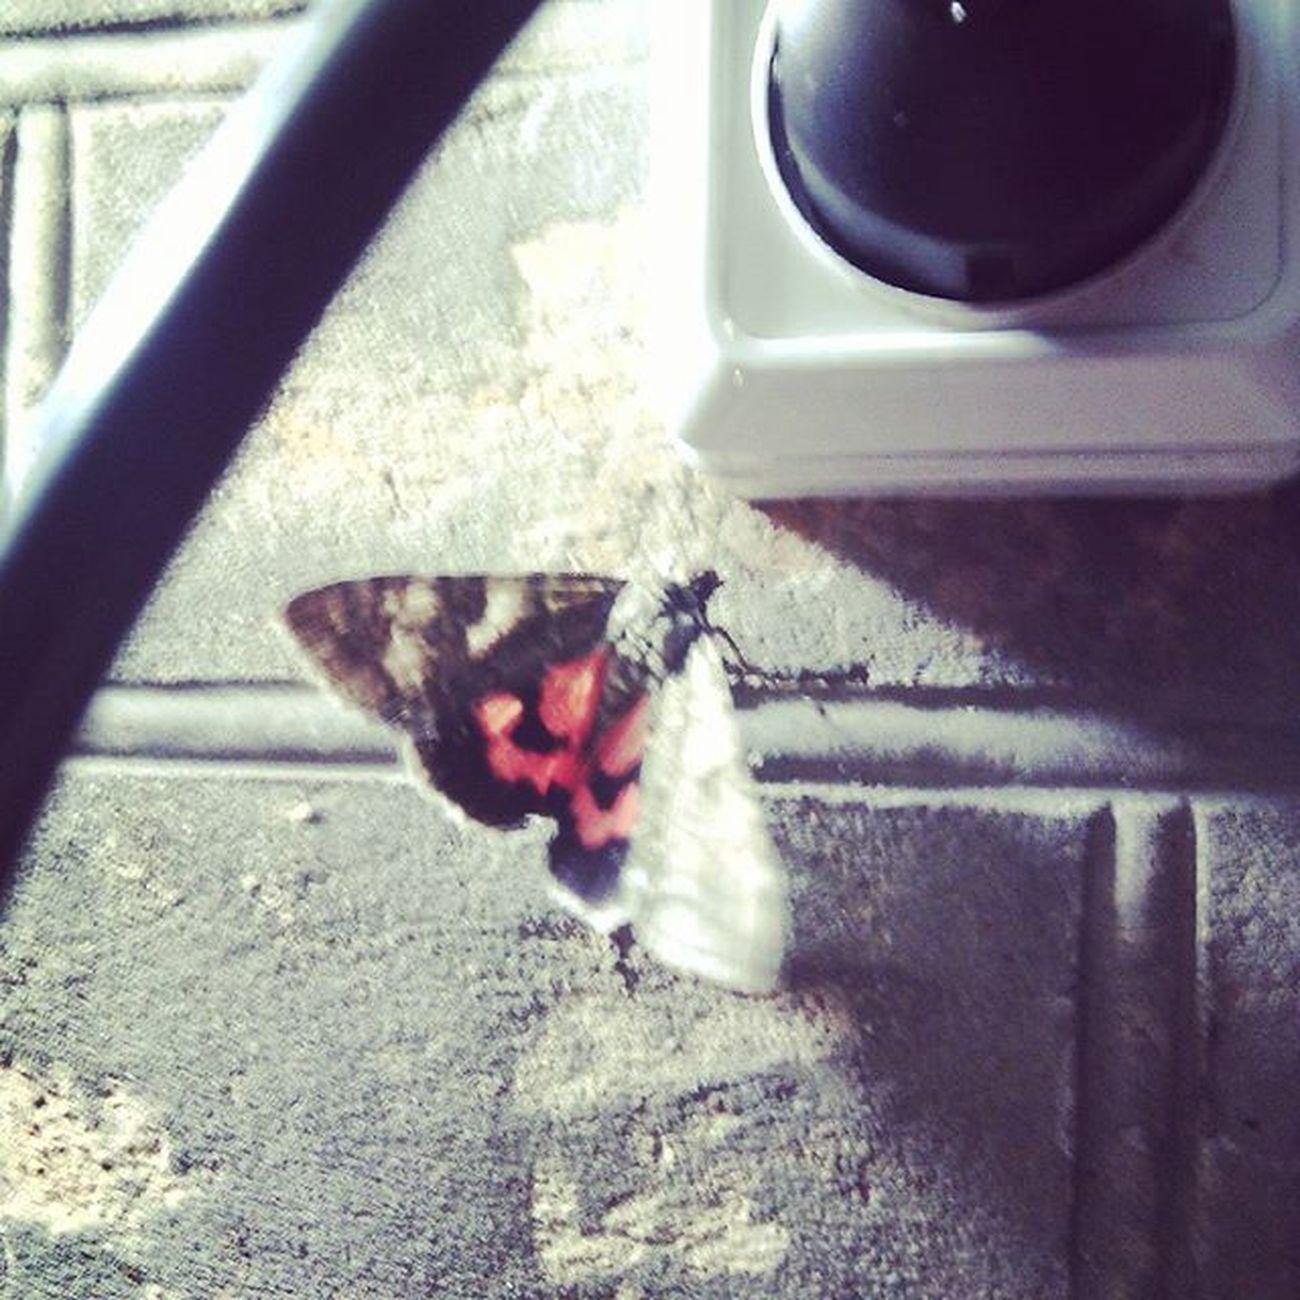 This is babochkaaaaa bleat' 😂 Joke Russians Russianjokes Butterfly красиво ночь хэштег лол моль бабочка насекомое